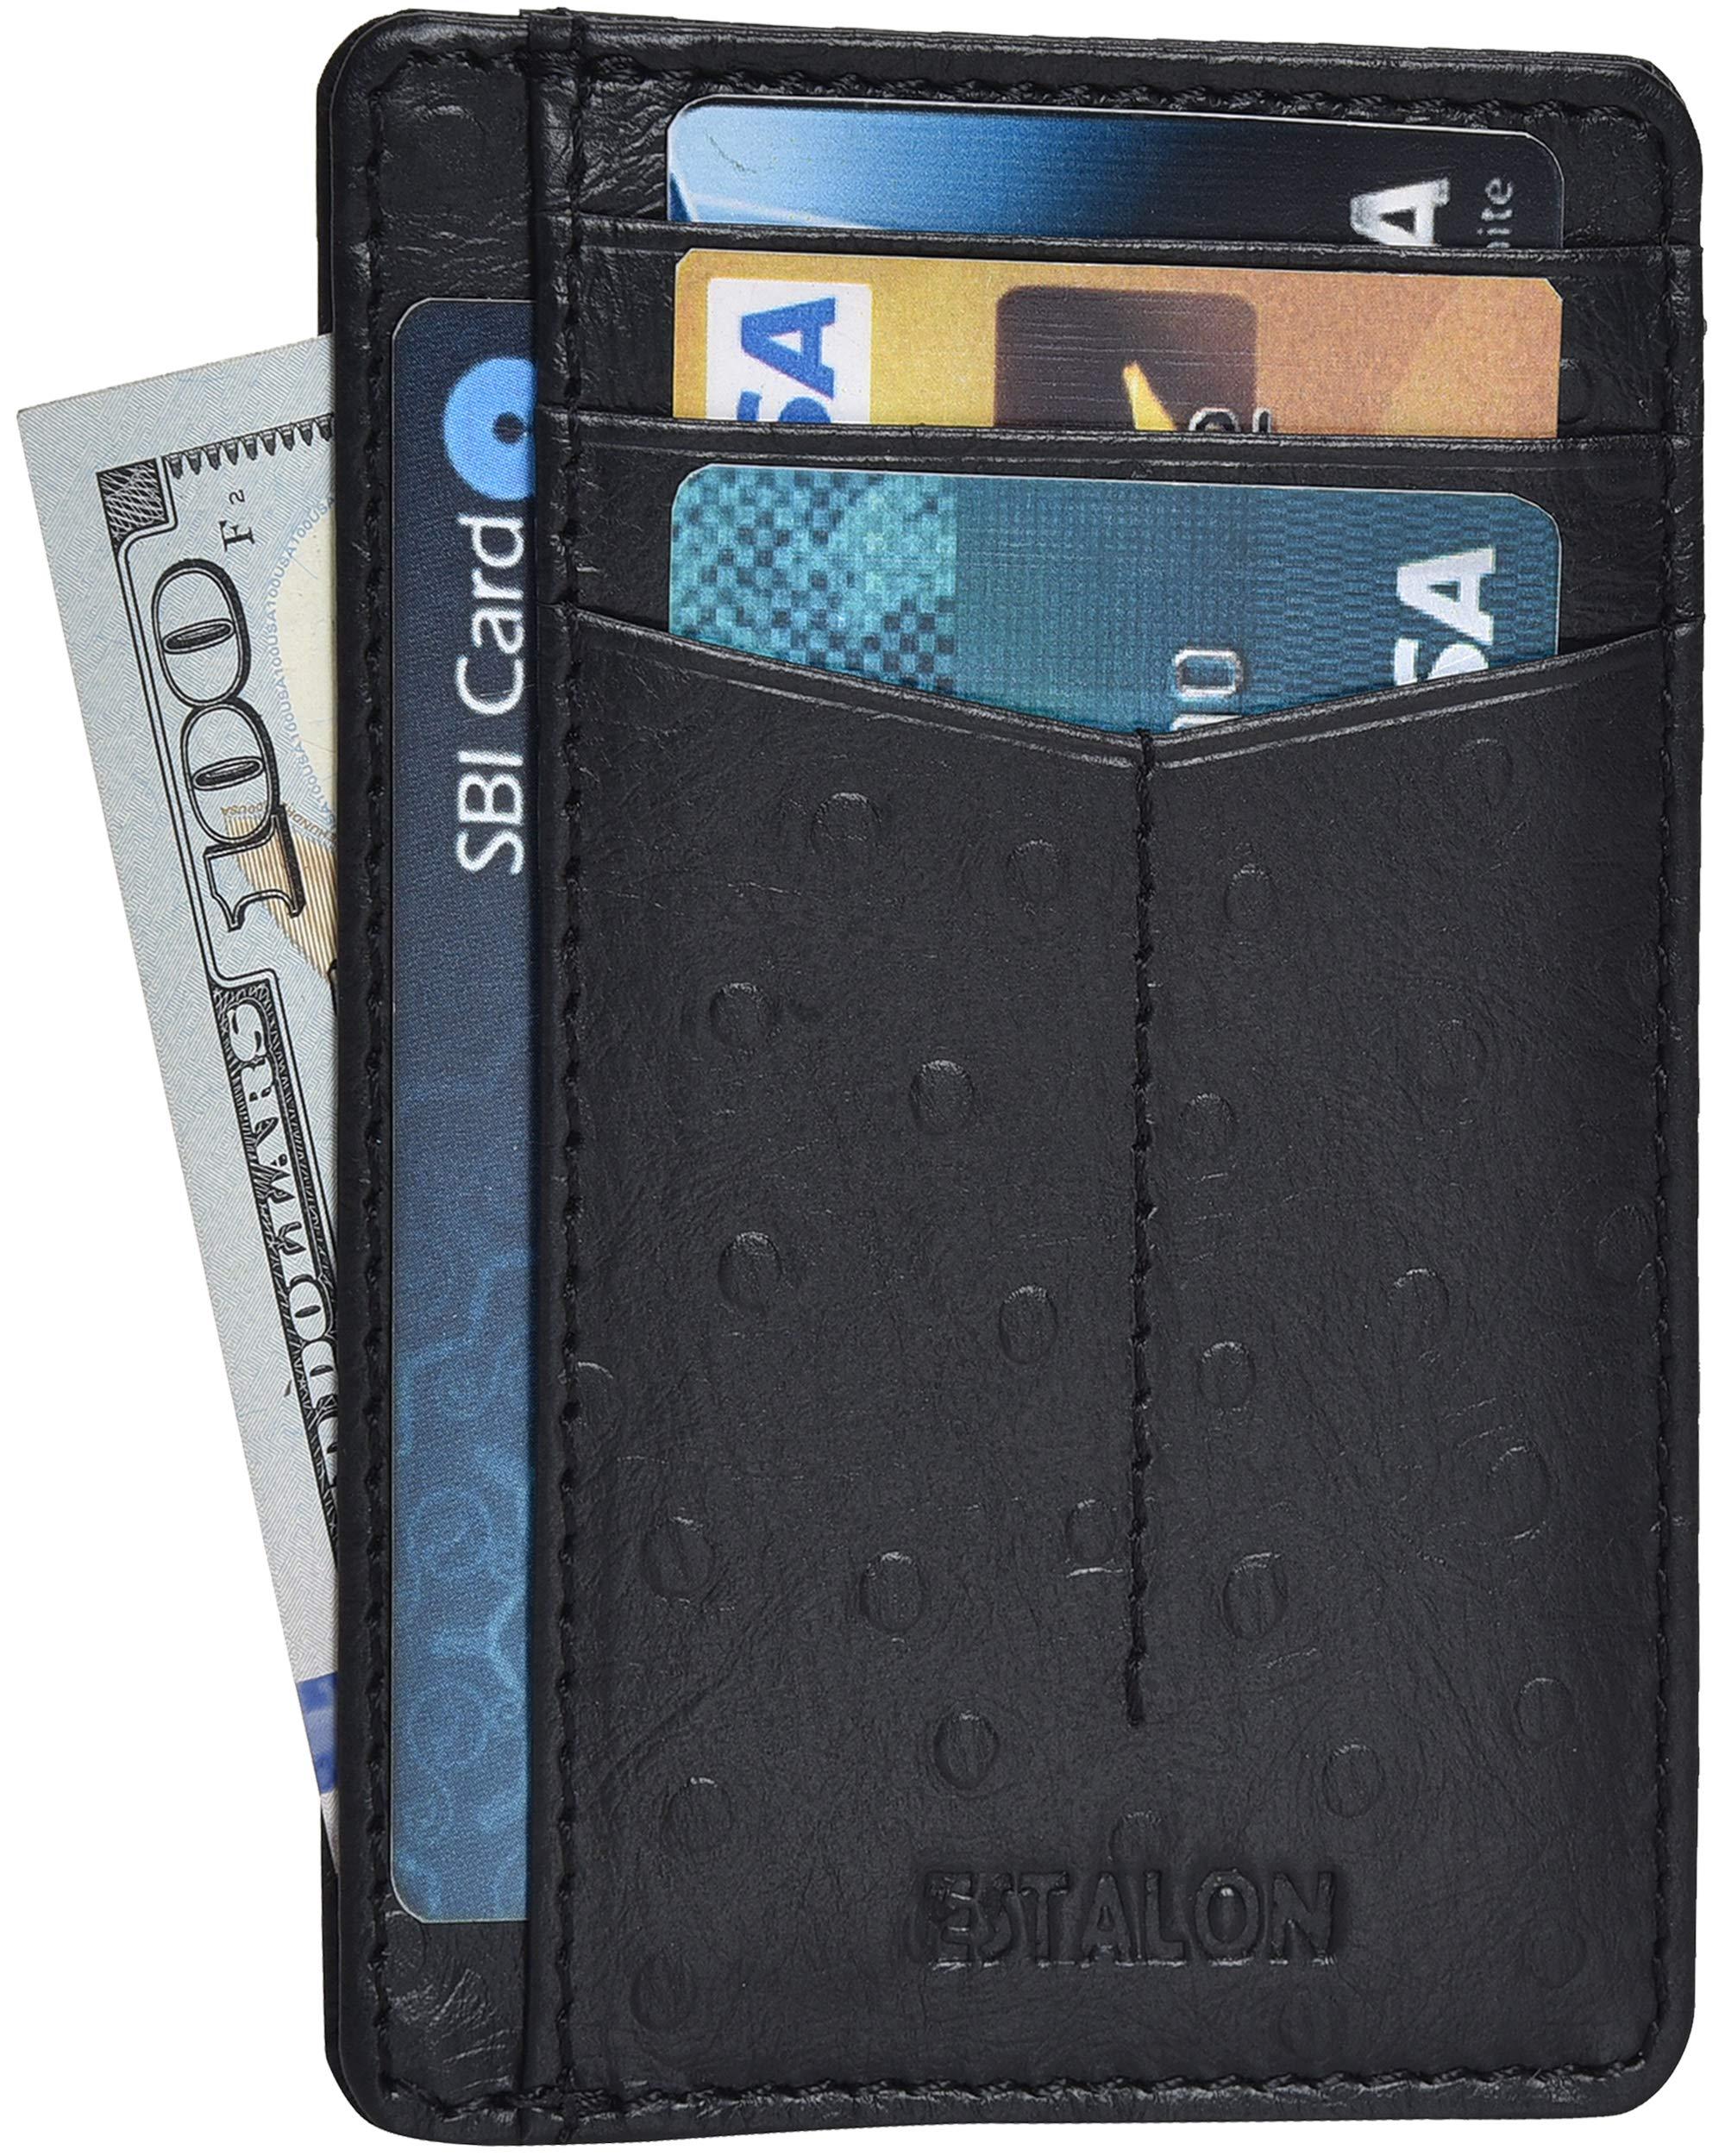 d33da920f18f0 Galleon - Front Pocket Slim Wallets For Men With RFID - Genuine Leather  Handmade Minimalist Credit Card Holder Gift Box (Black Ostrich Print Curve)